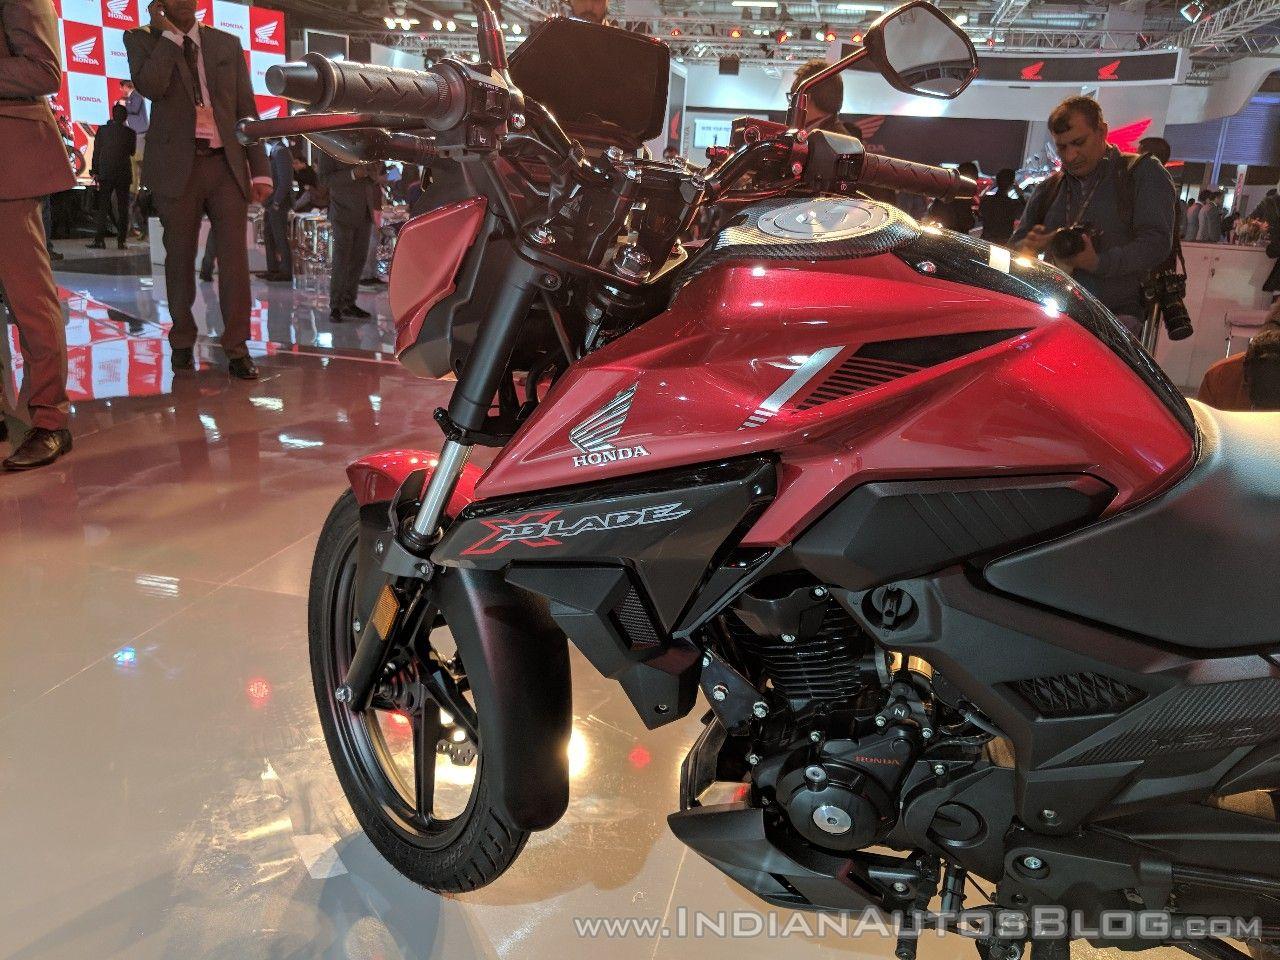 Honda X-Blade Red fuel tank at 2018 Auto Expo